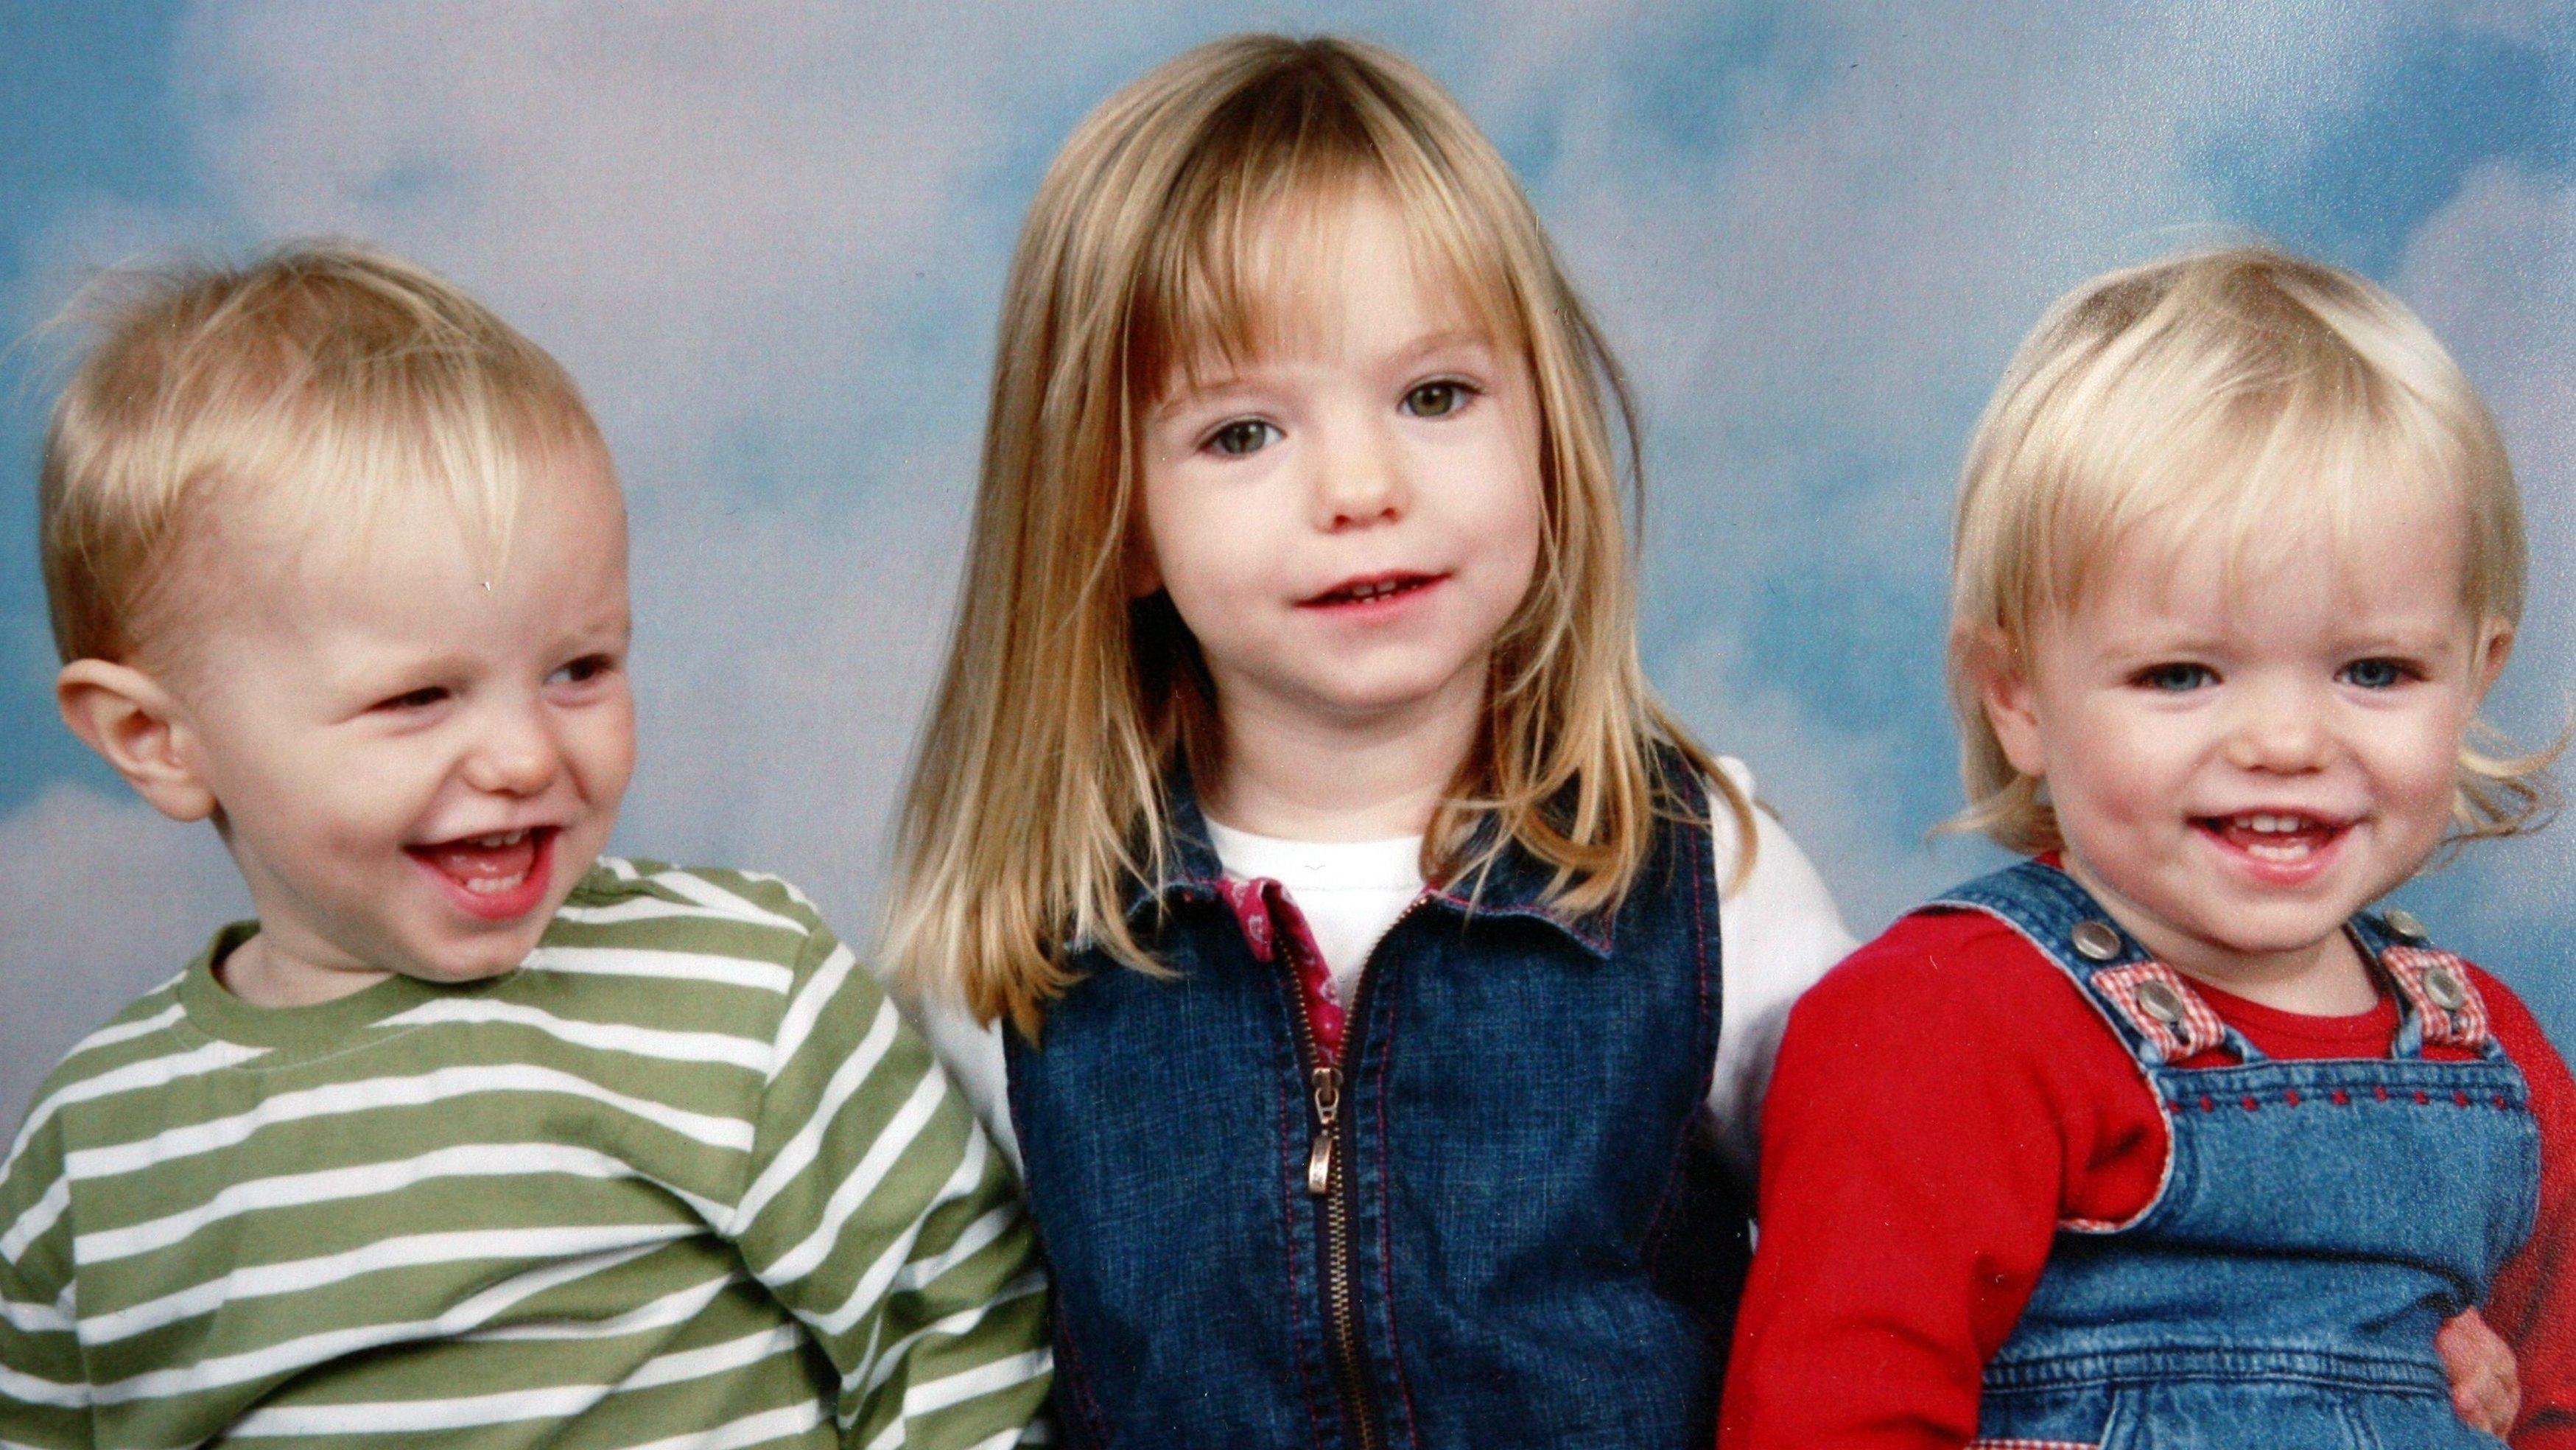 The McCann children